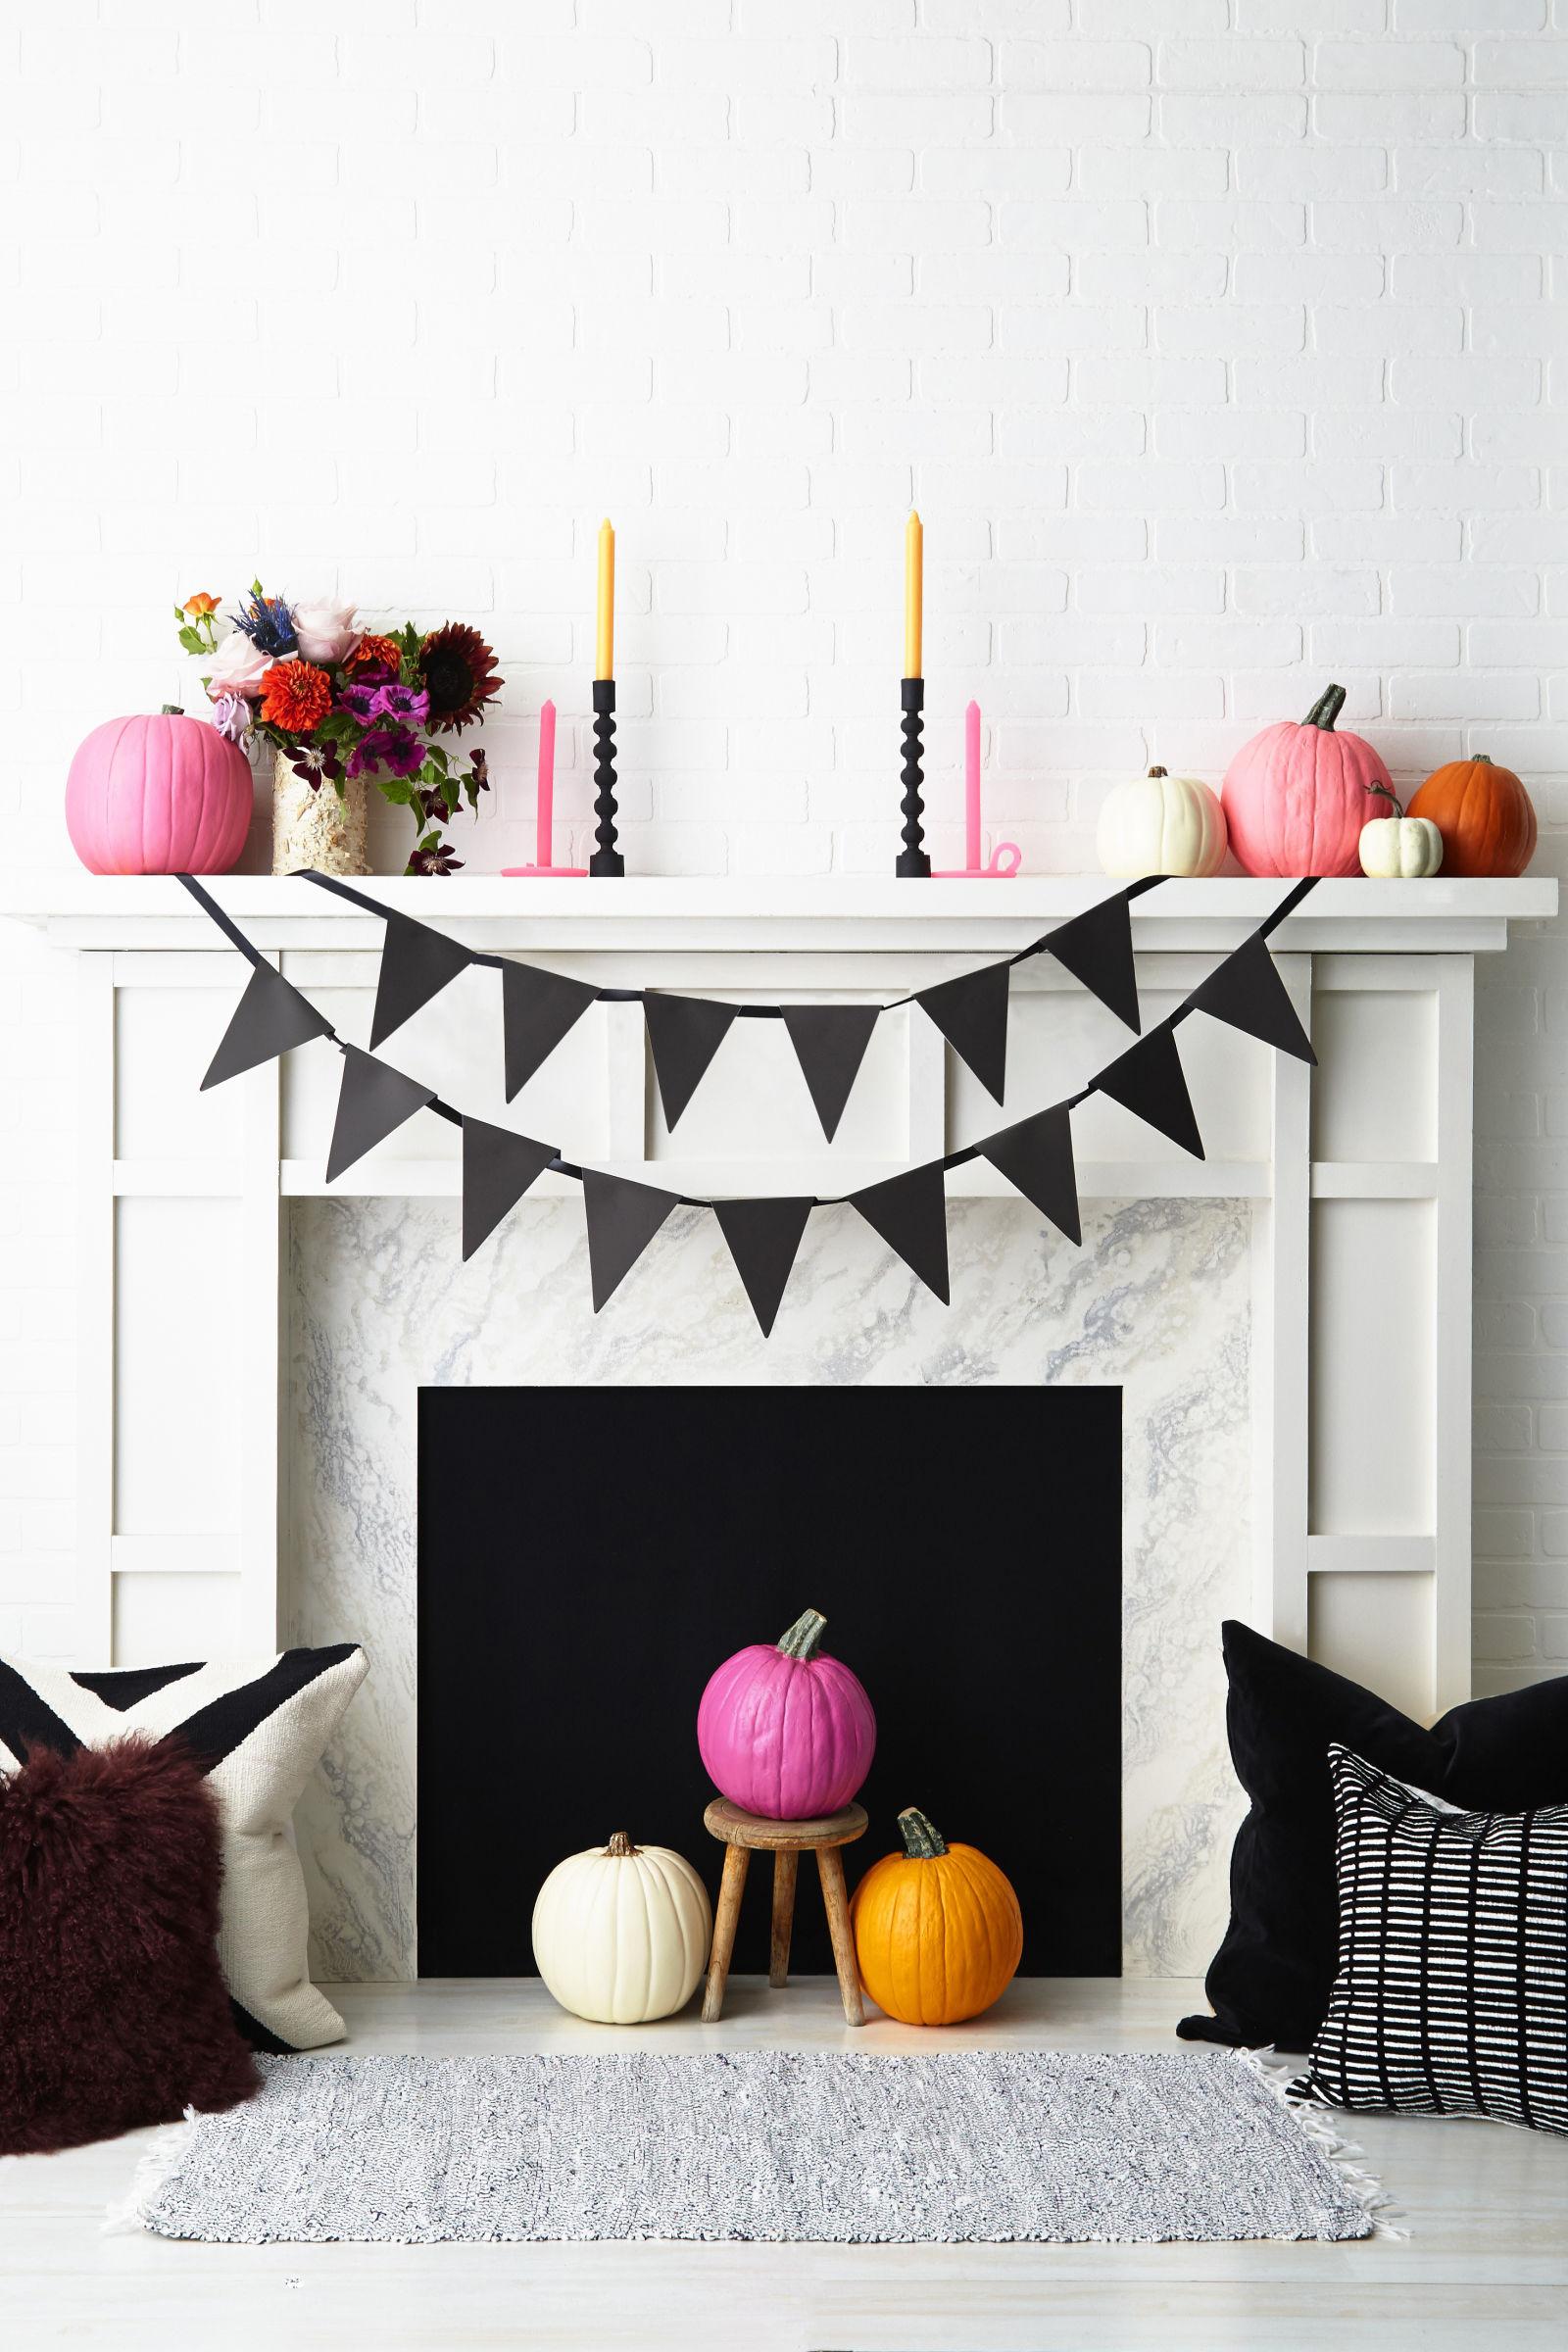 30+ Scary DIY Halloween Decorations - Cool Homemade Ideas ...